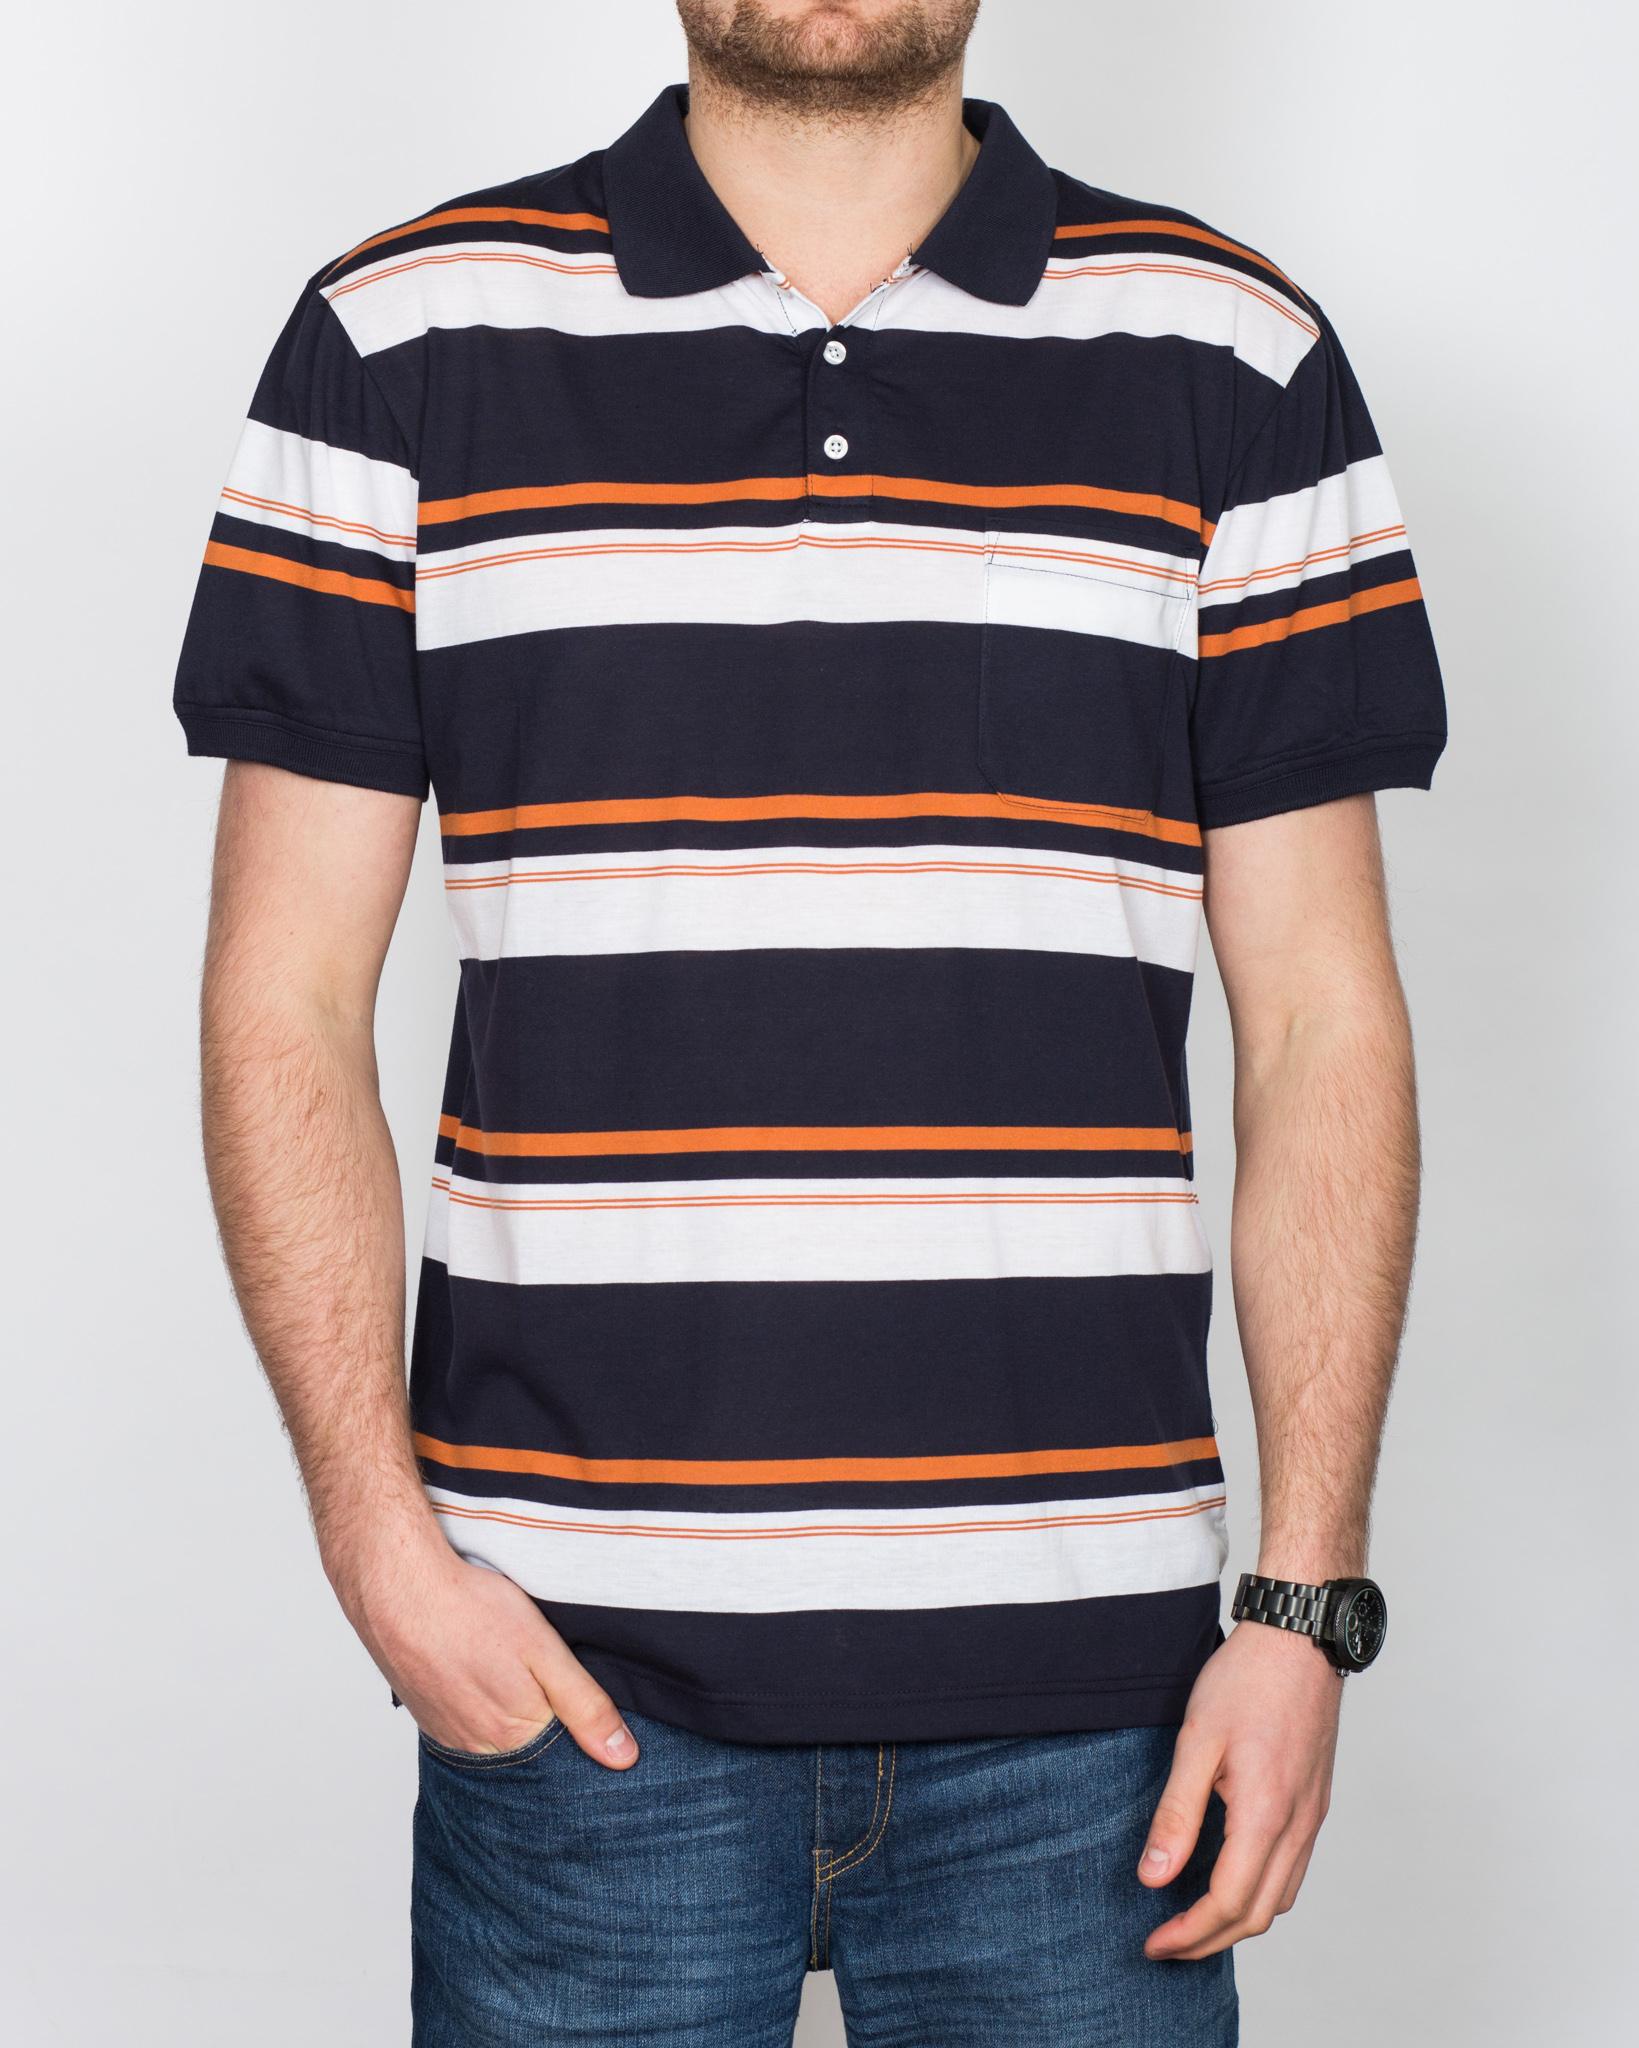 North 56 Striped Tall Polo Shirt (navy)